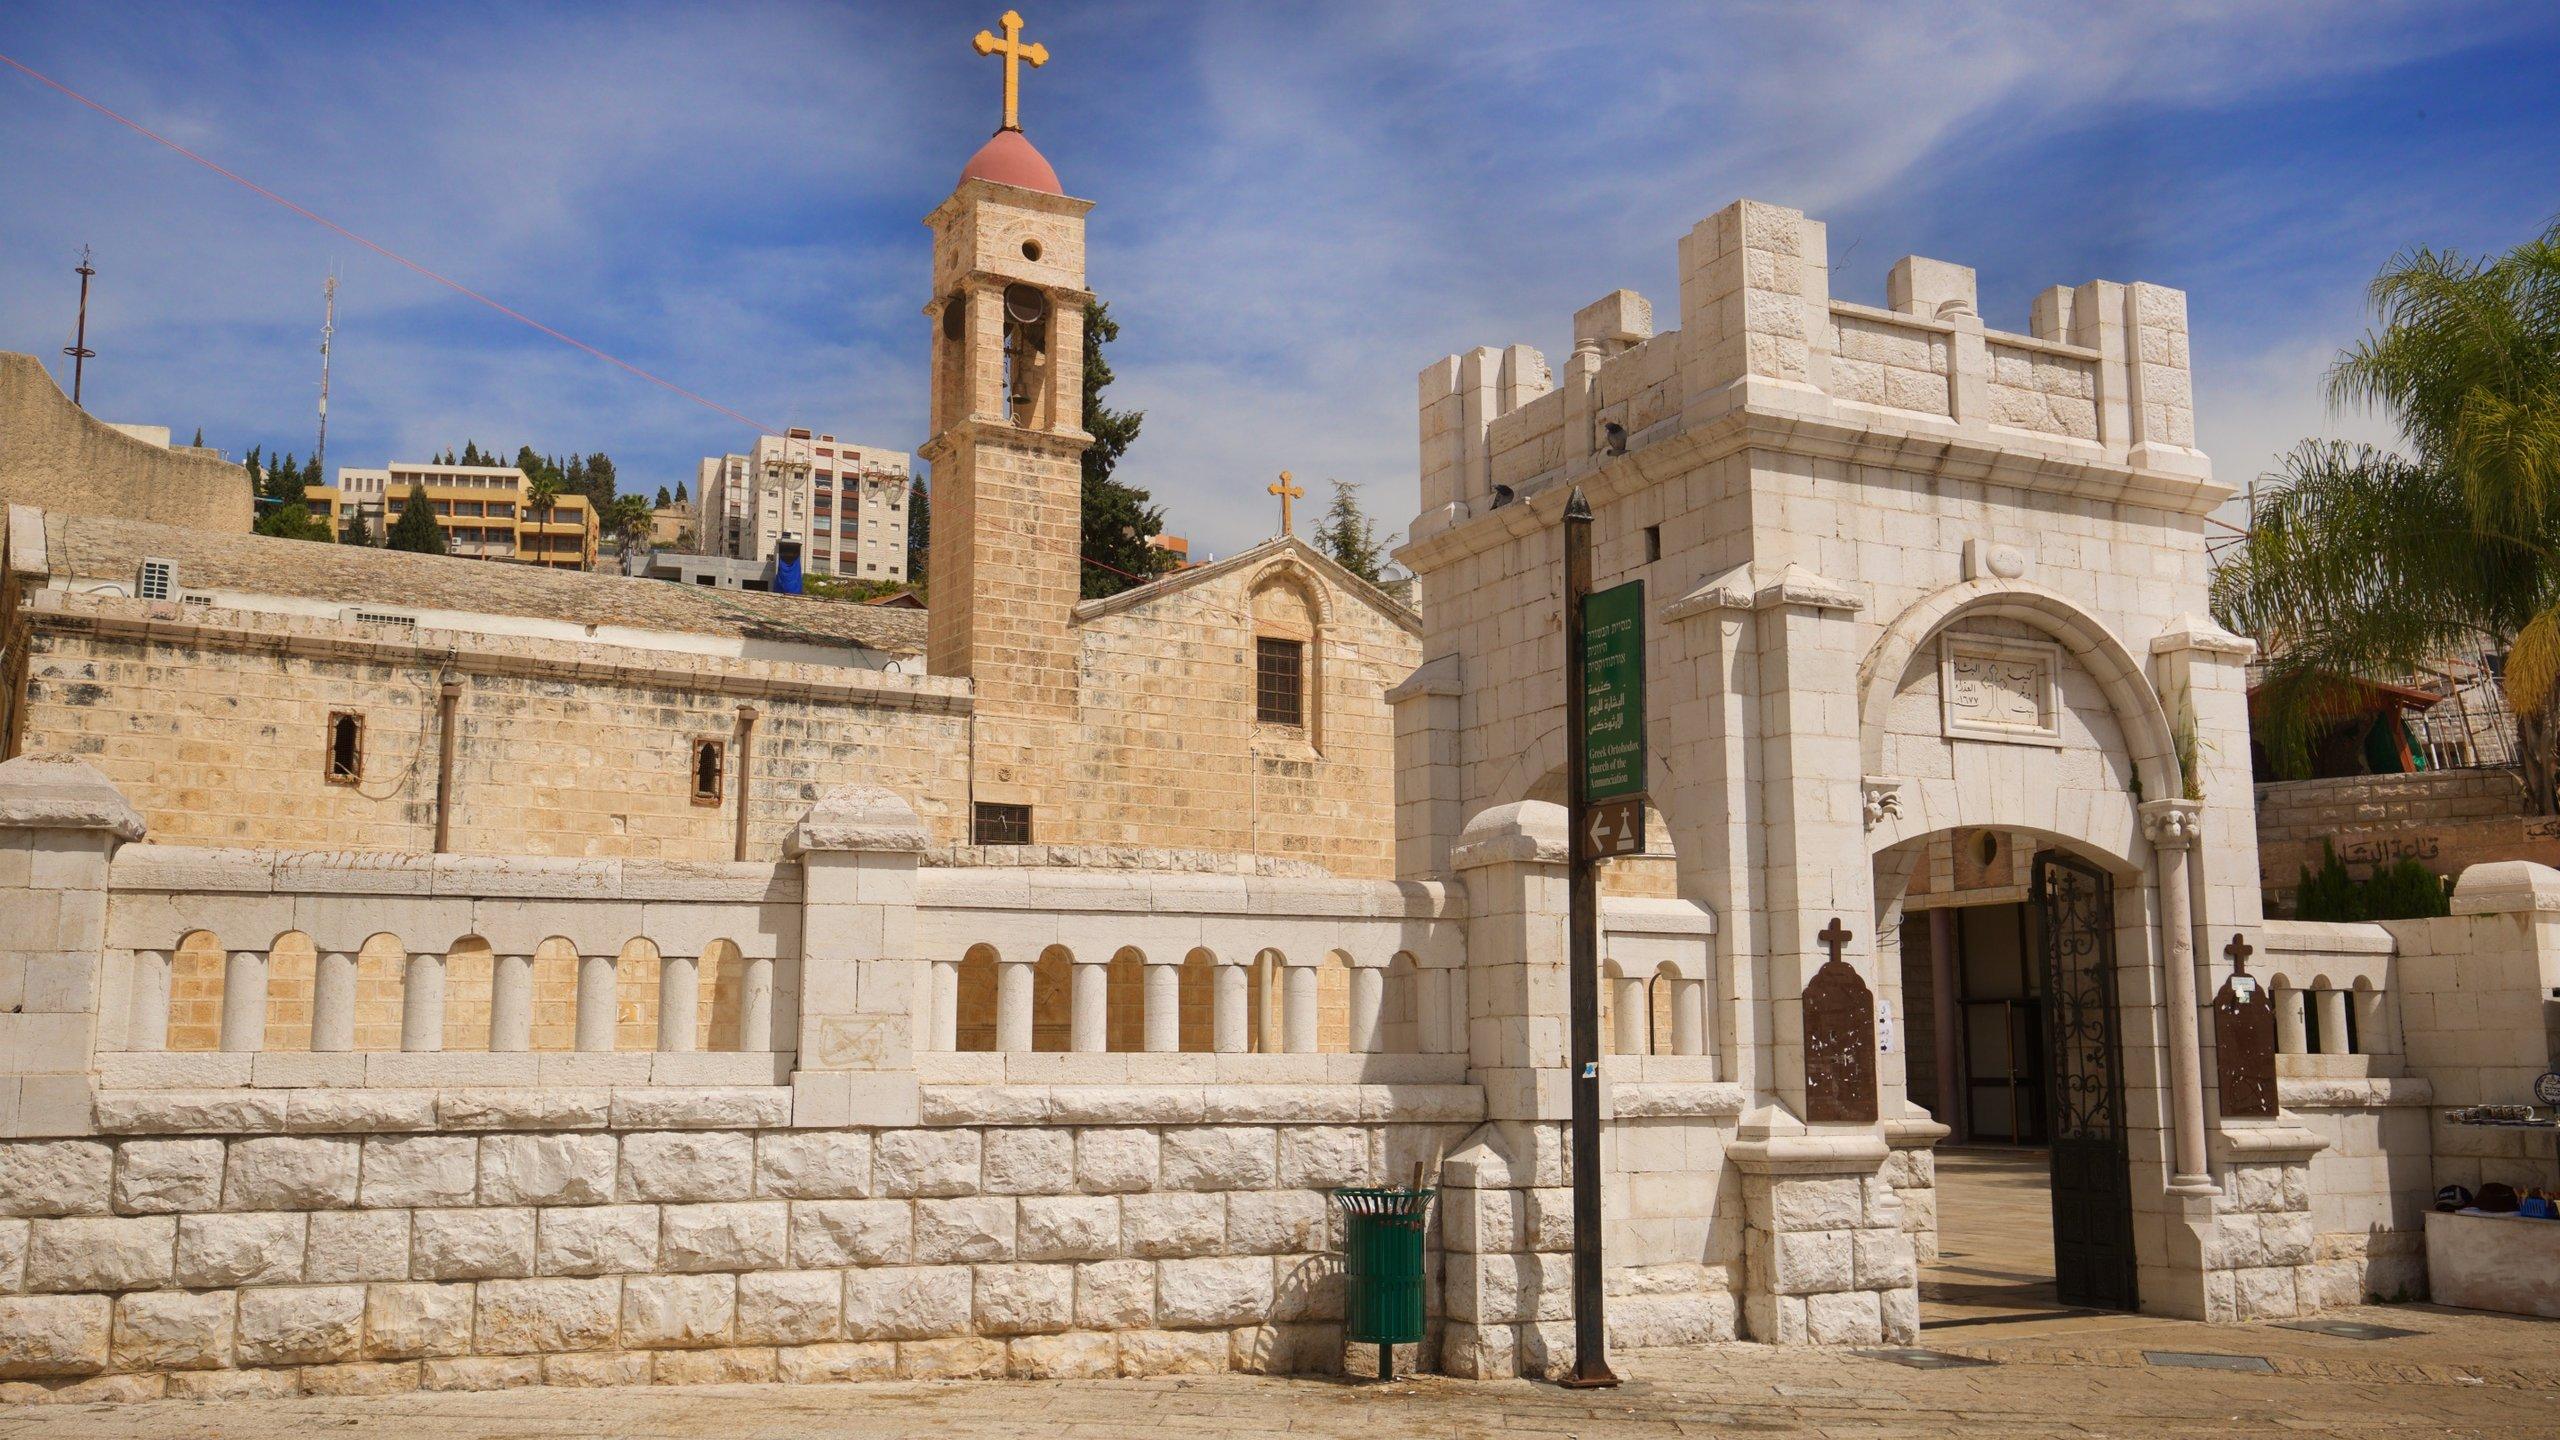 Greek Orthodox Church of the Annunciation, Nazareth, Northern District, Israel